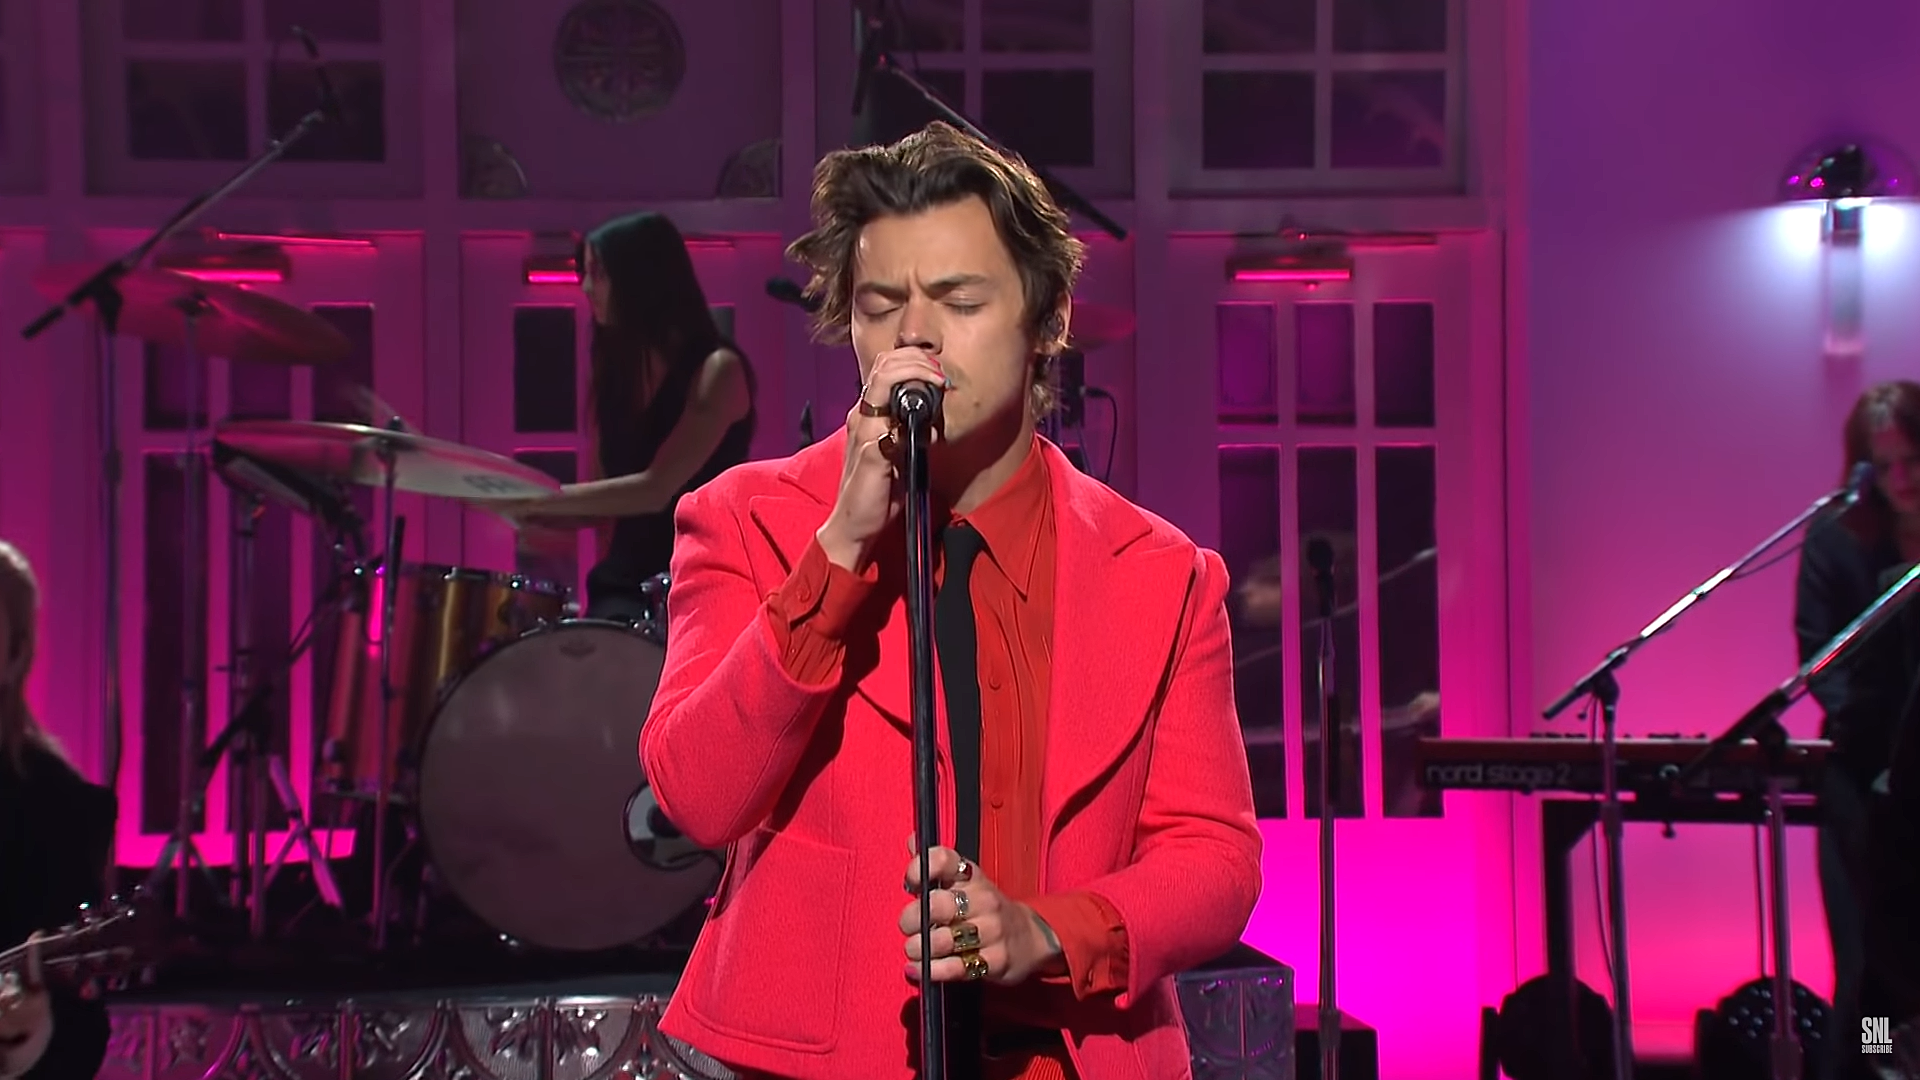 Harry Styles Debuts Watermelon Sugar On Saturday Night Live